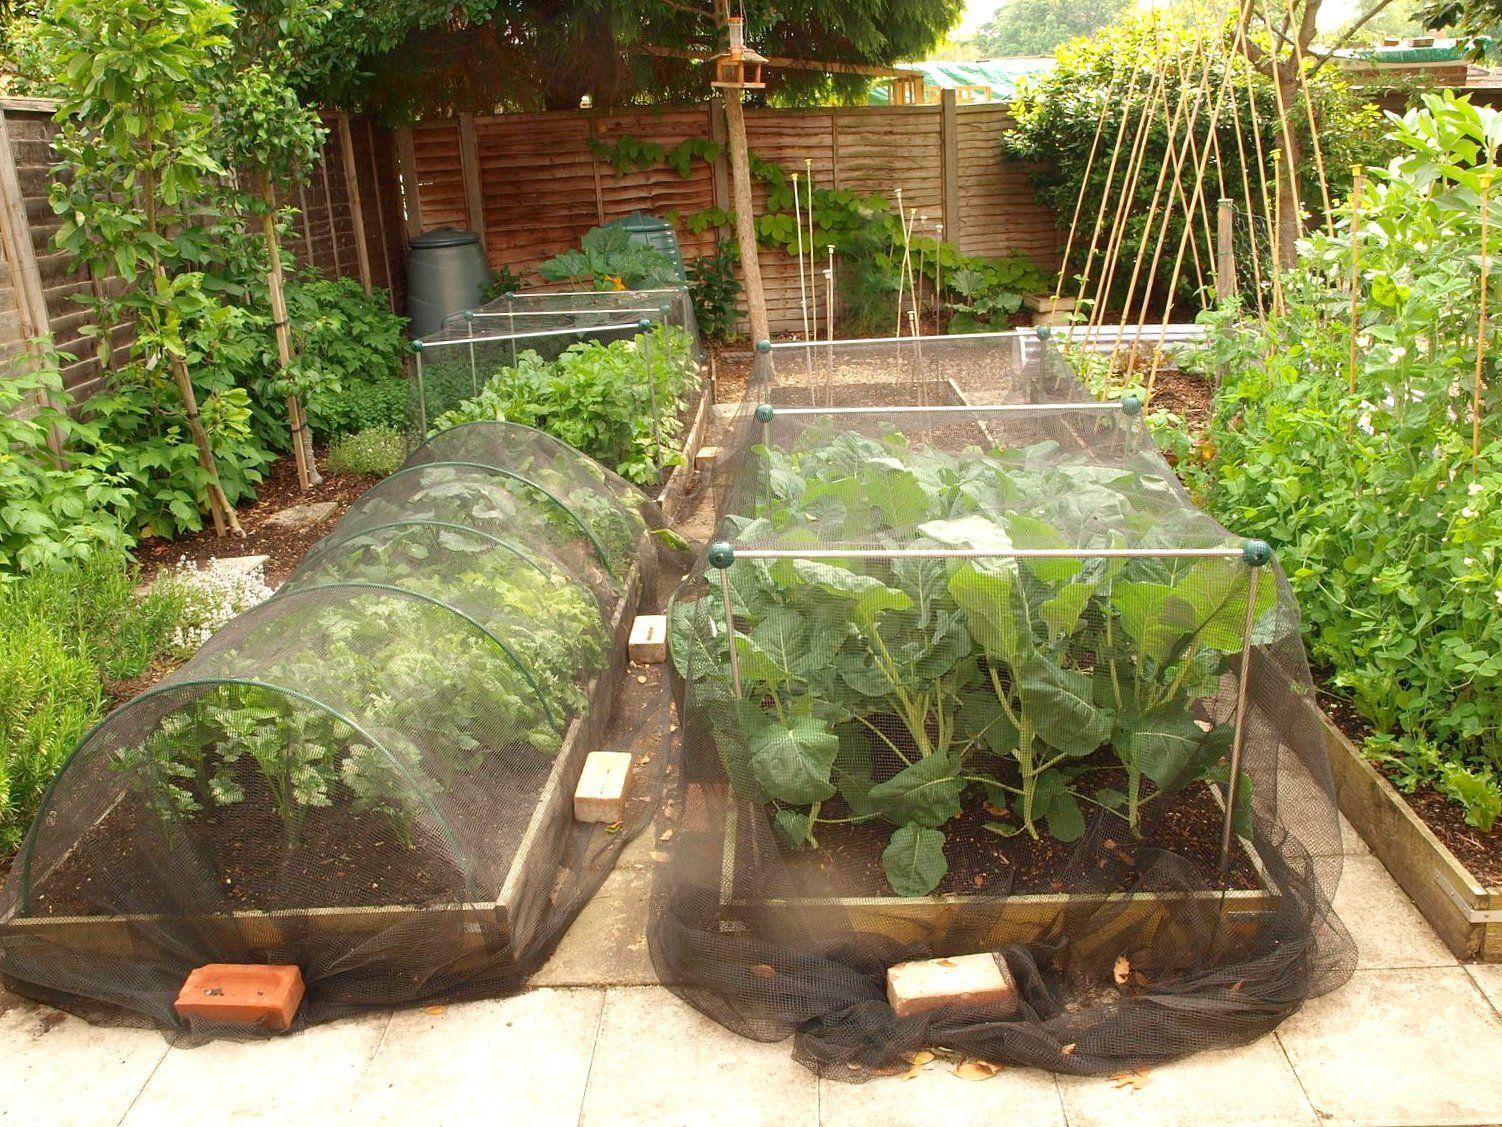 Raised+bed3.JPG 1,502×1,127 pixels Gardening advice